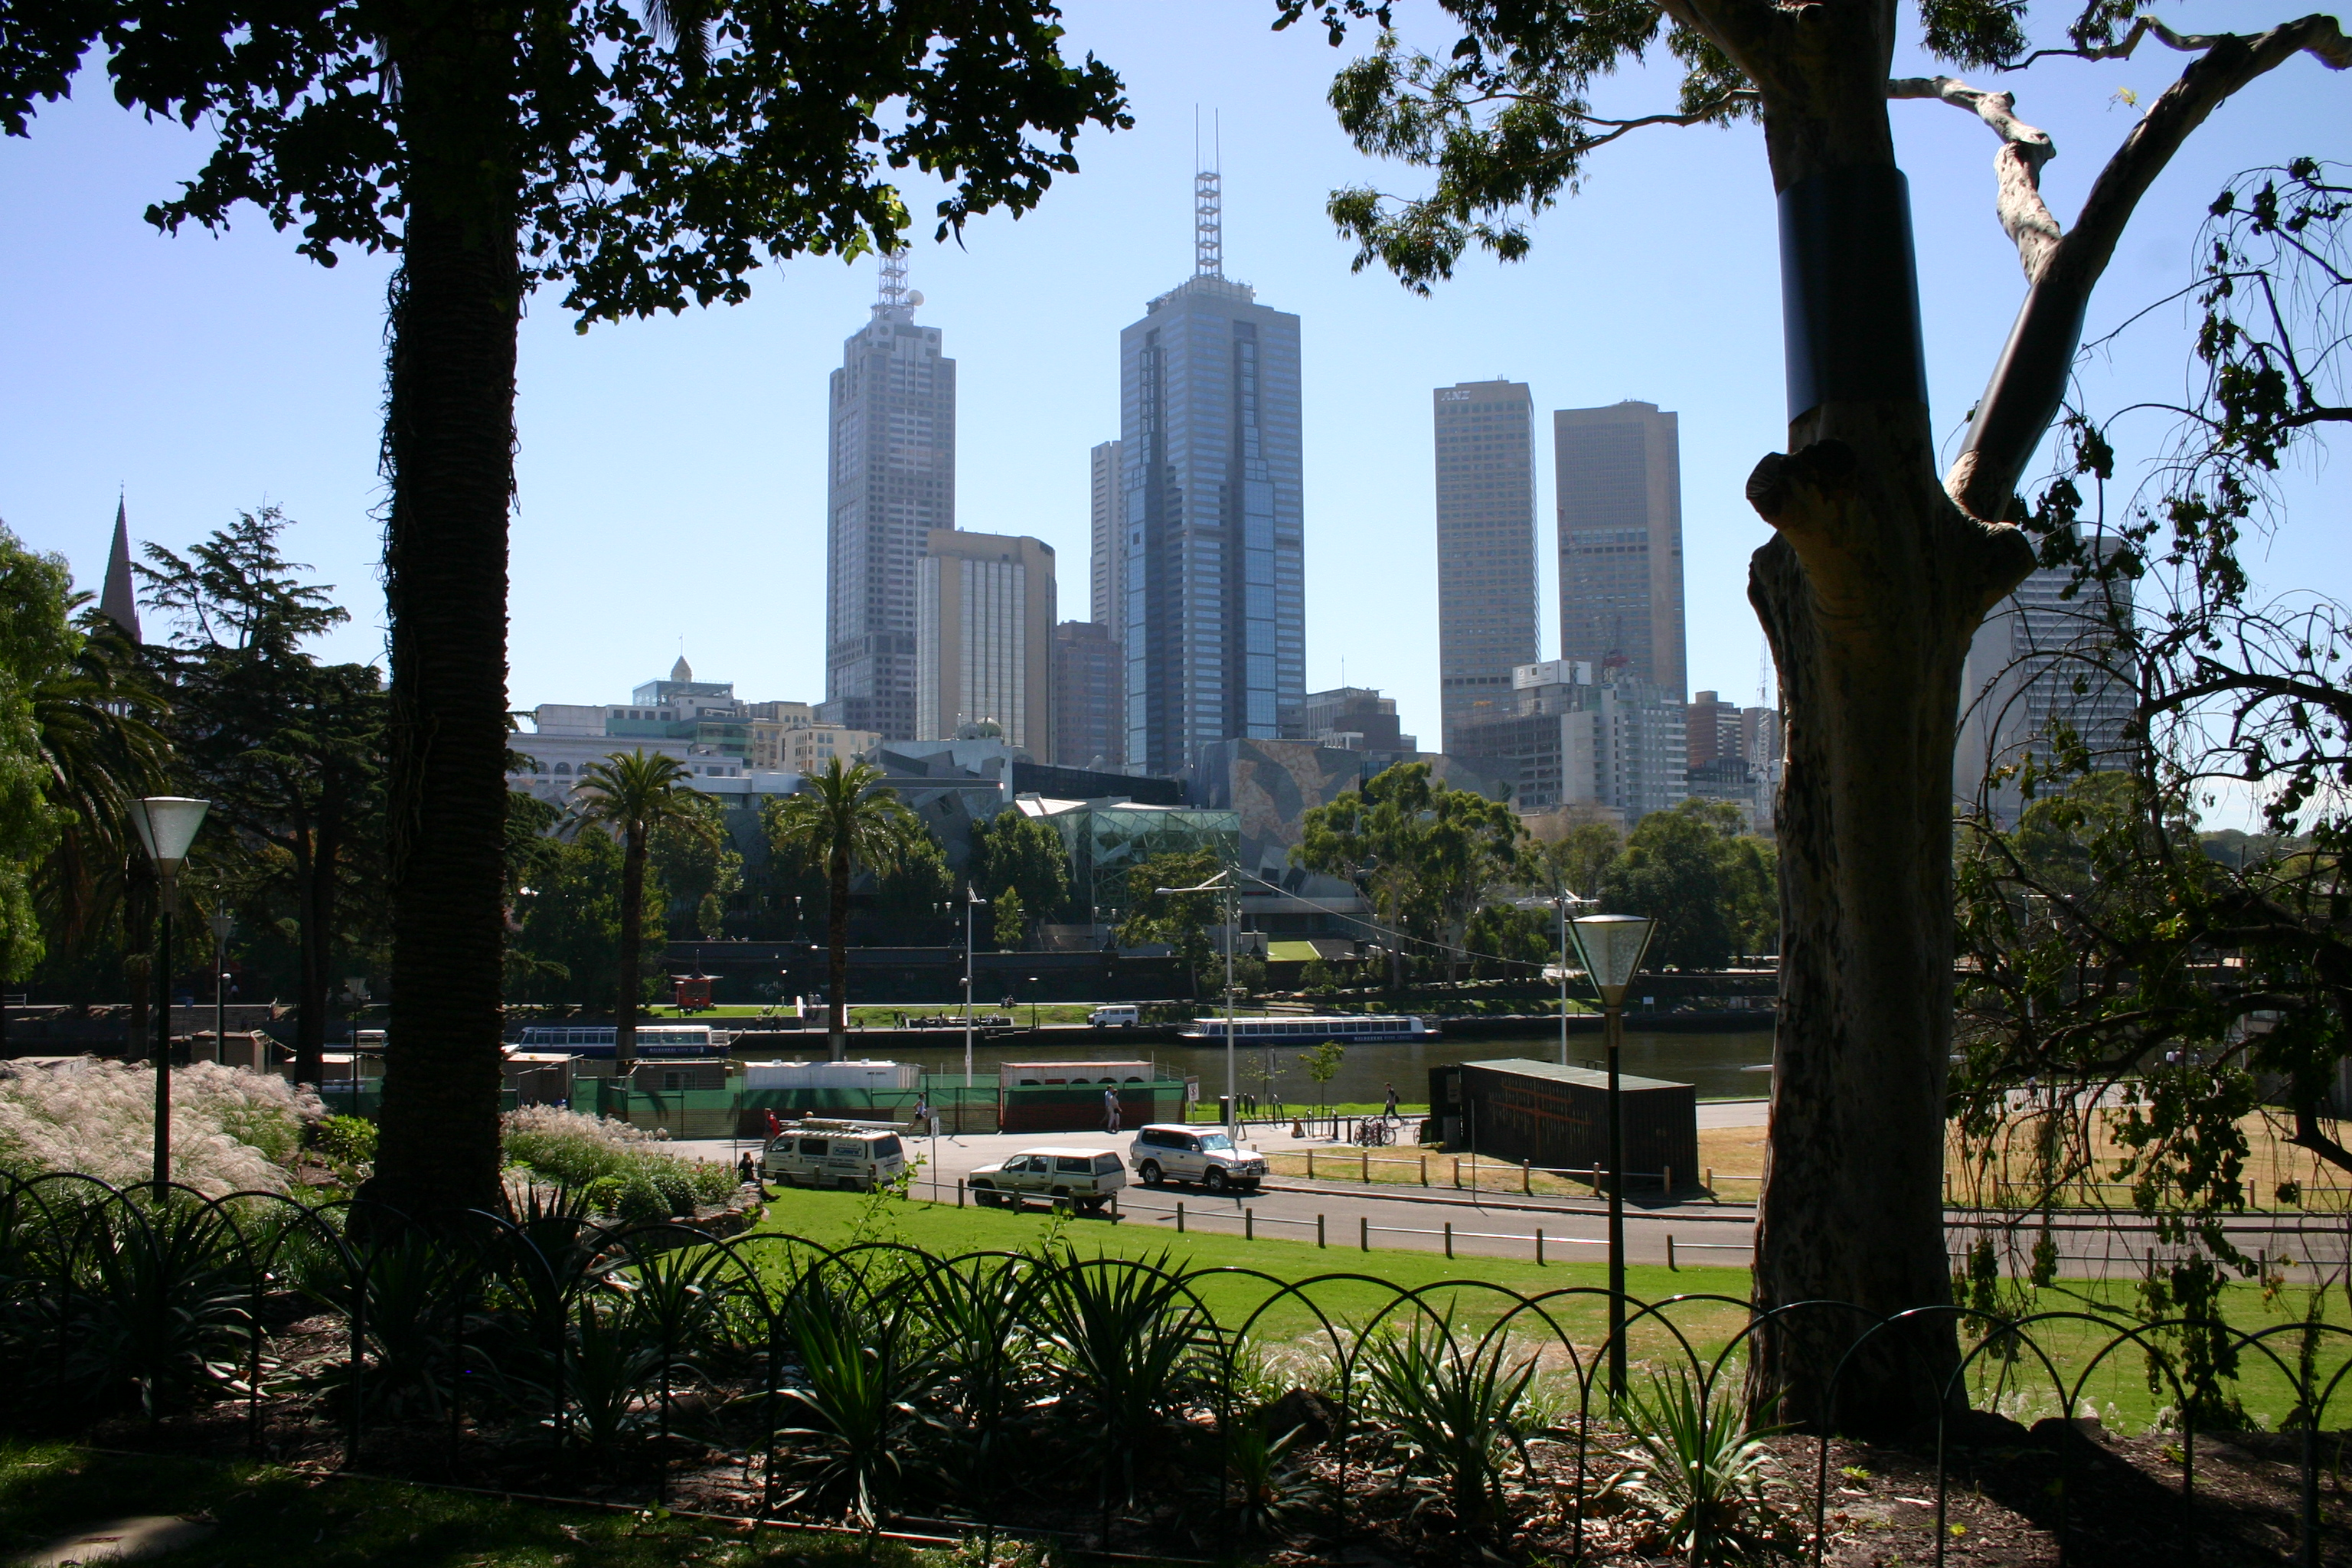 tasmanischer teufel wikipedia